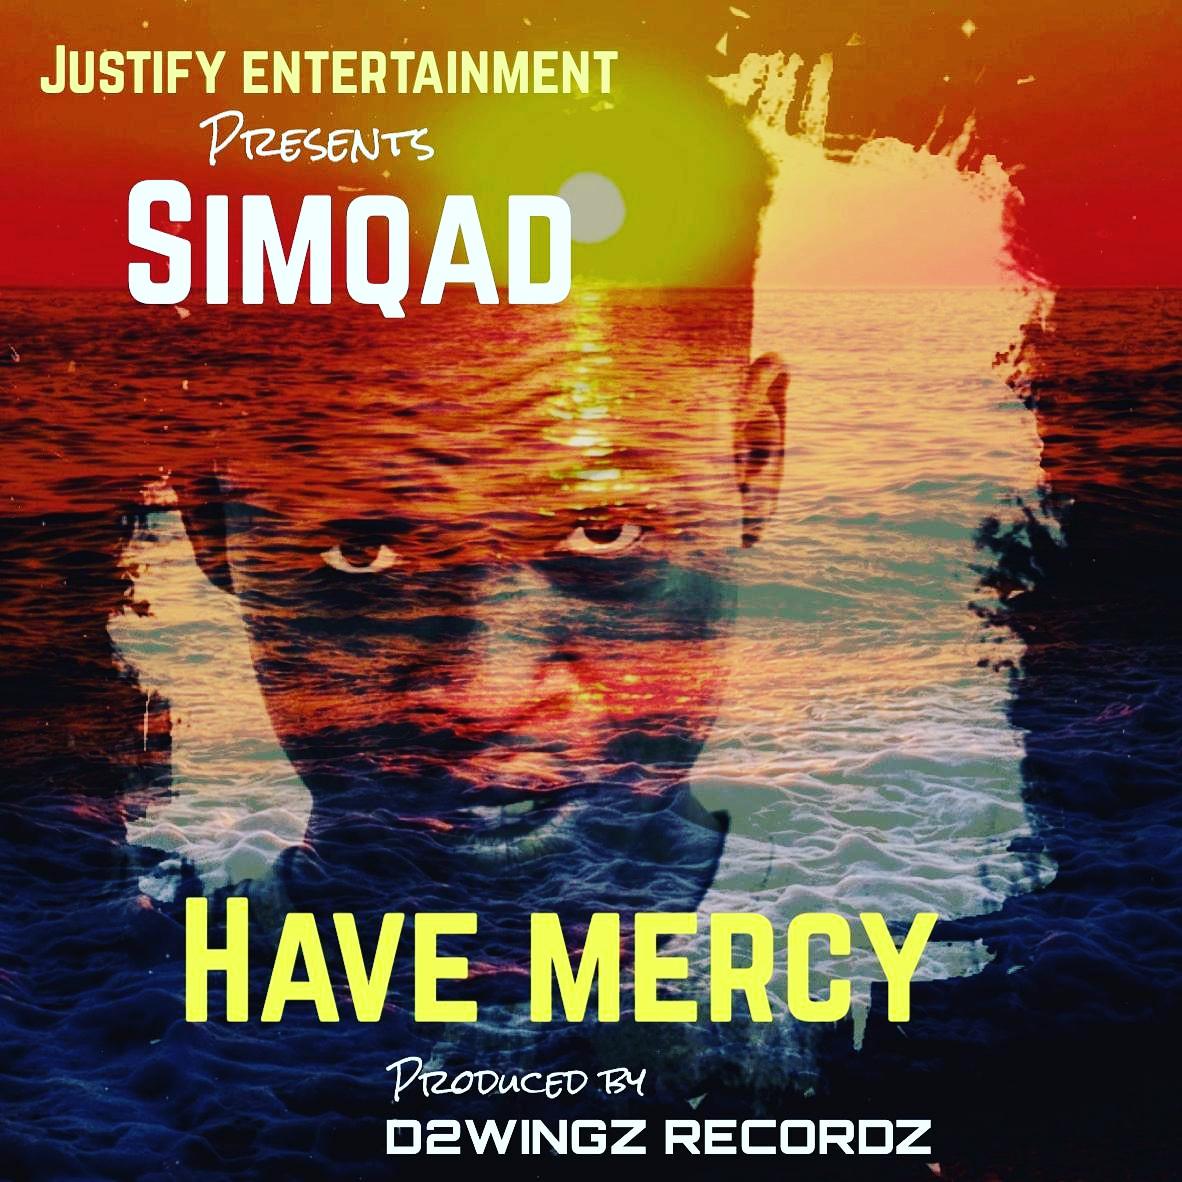 simqad - Have mercy